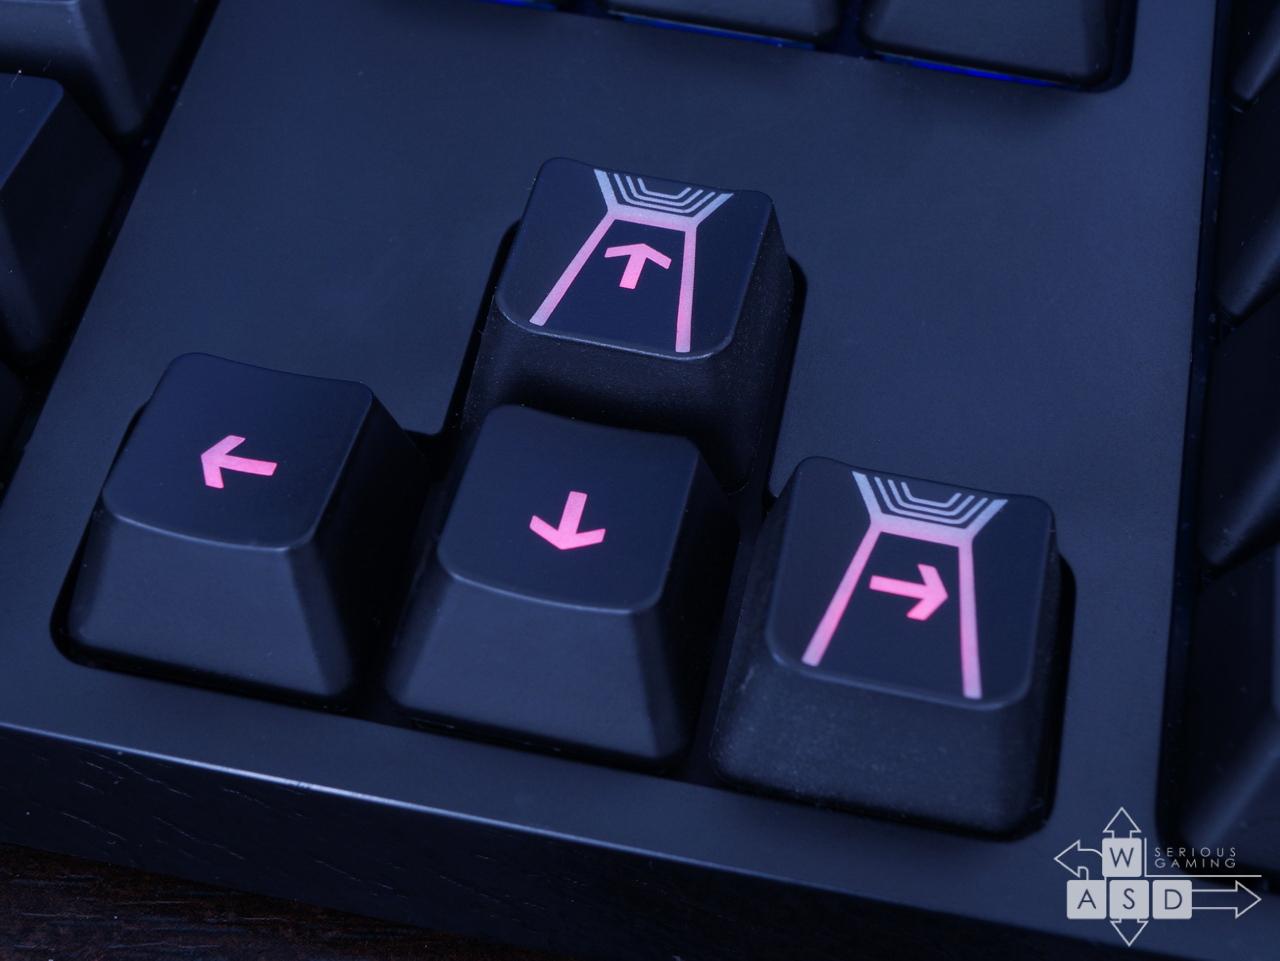 G810 cu doua keycaps de G910